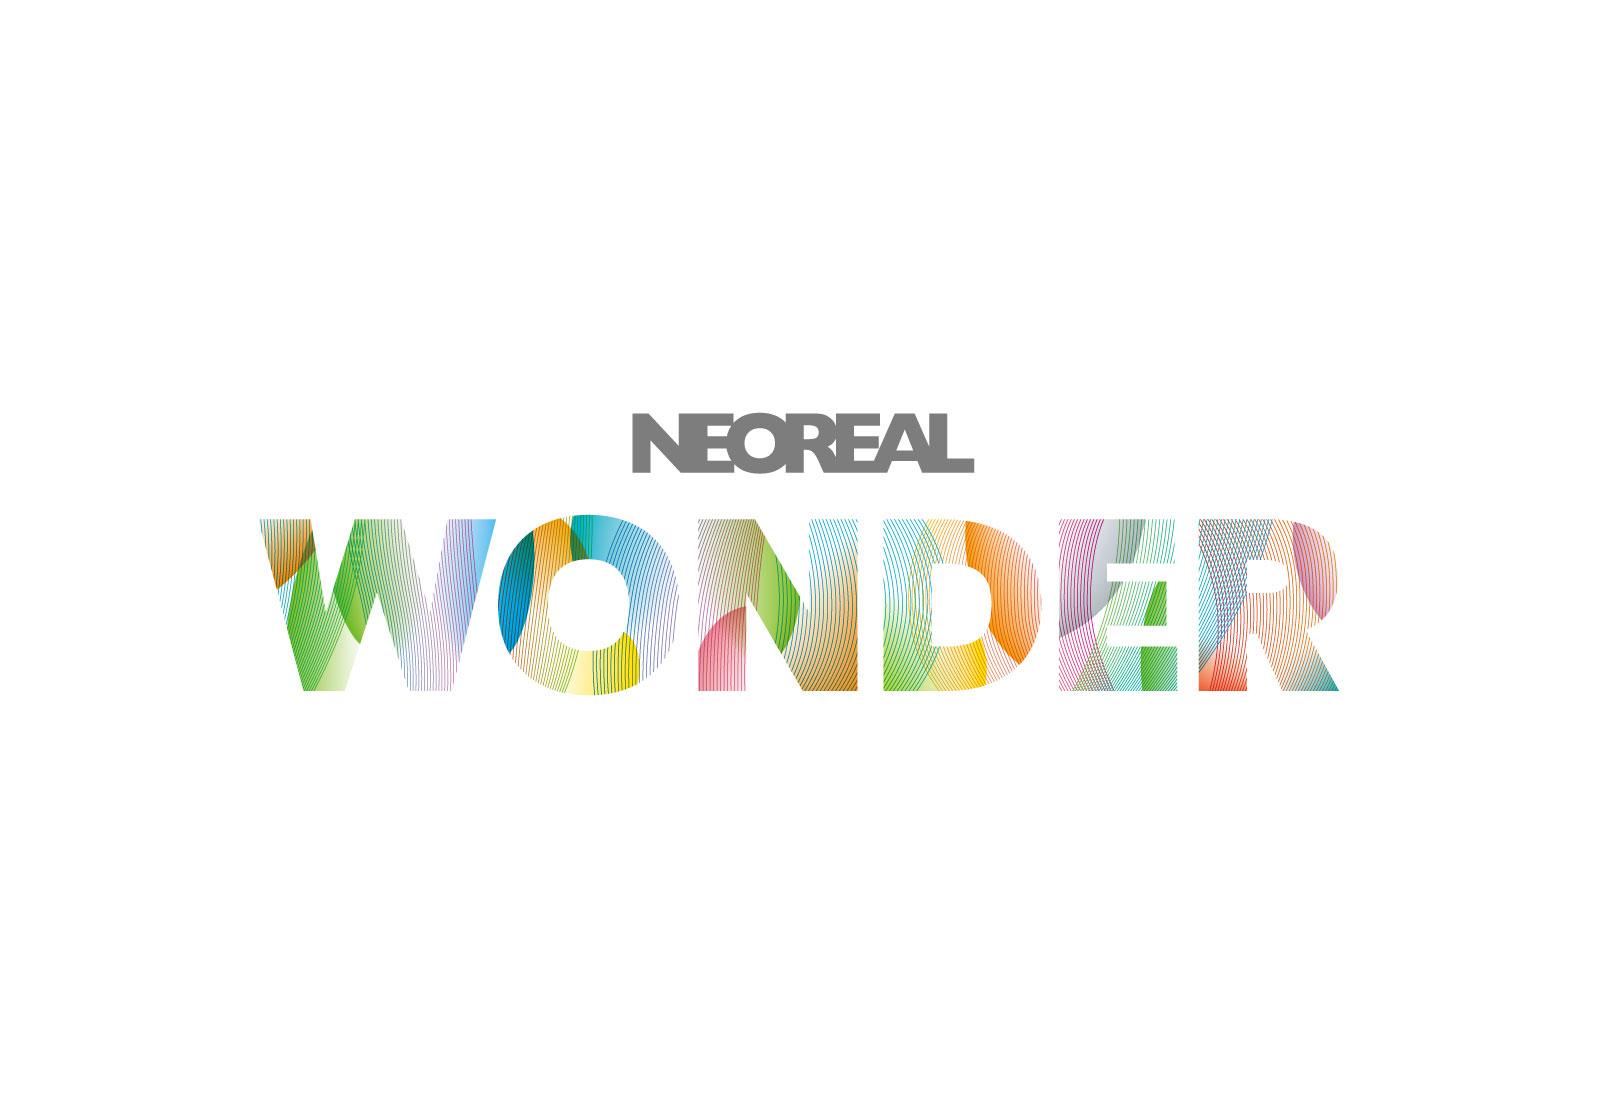 NEOREAL WONDER